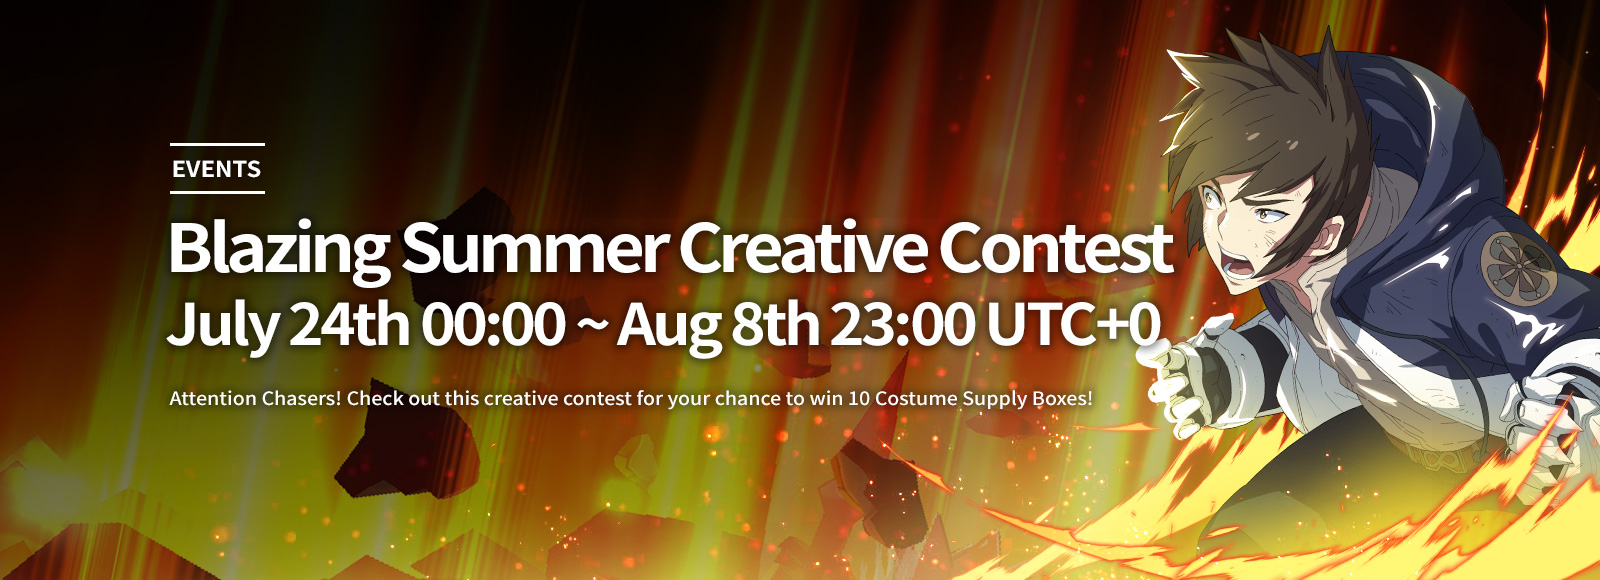 Blazing Summer Creative Contest